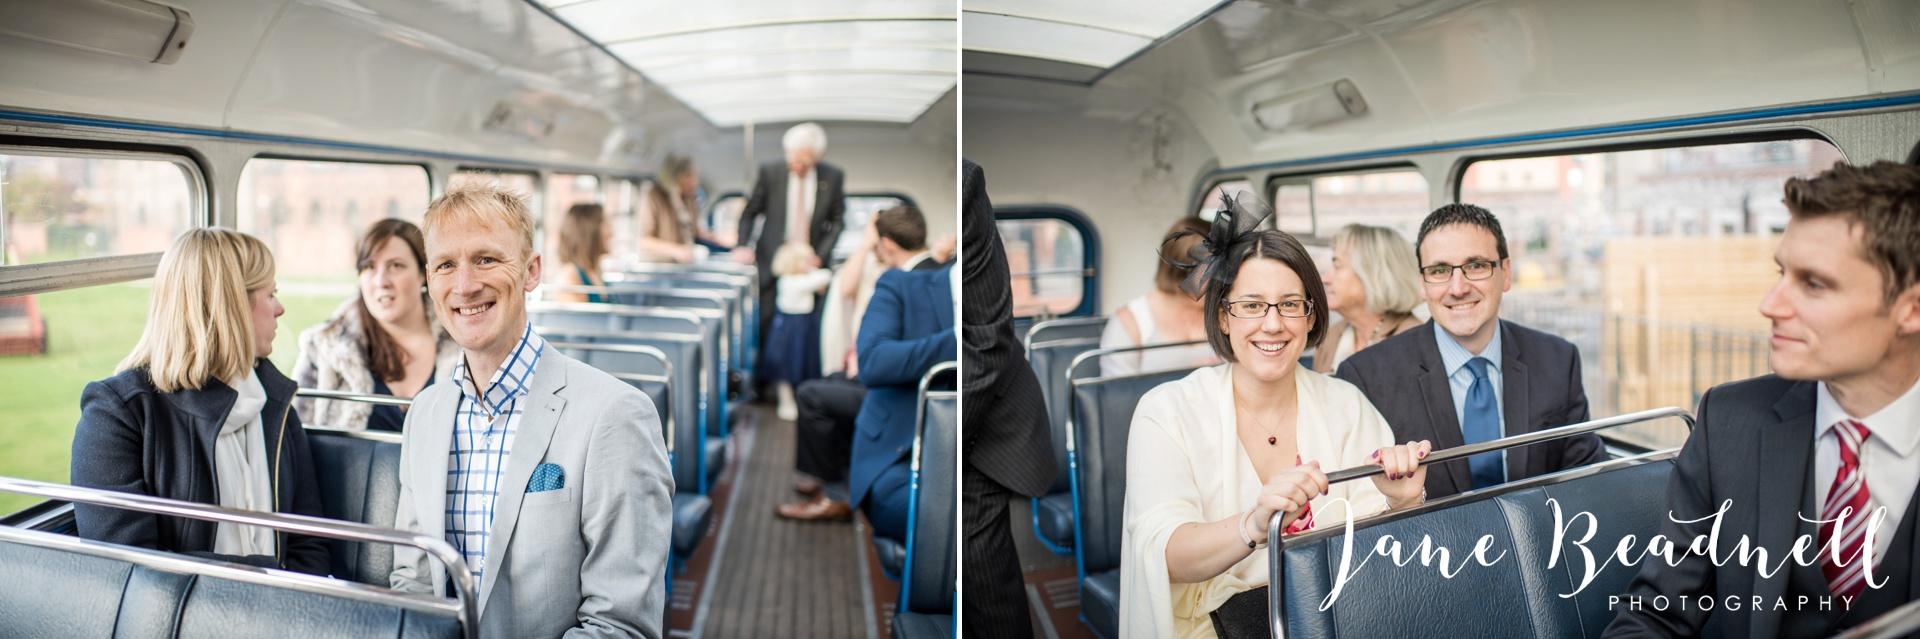 The Tetley Leeds Wedding Photography by Jane Beadnell_0026